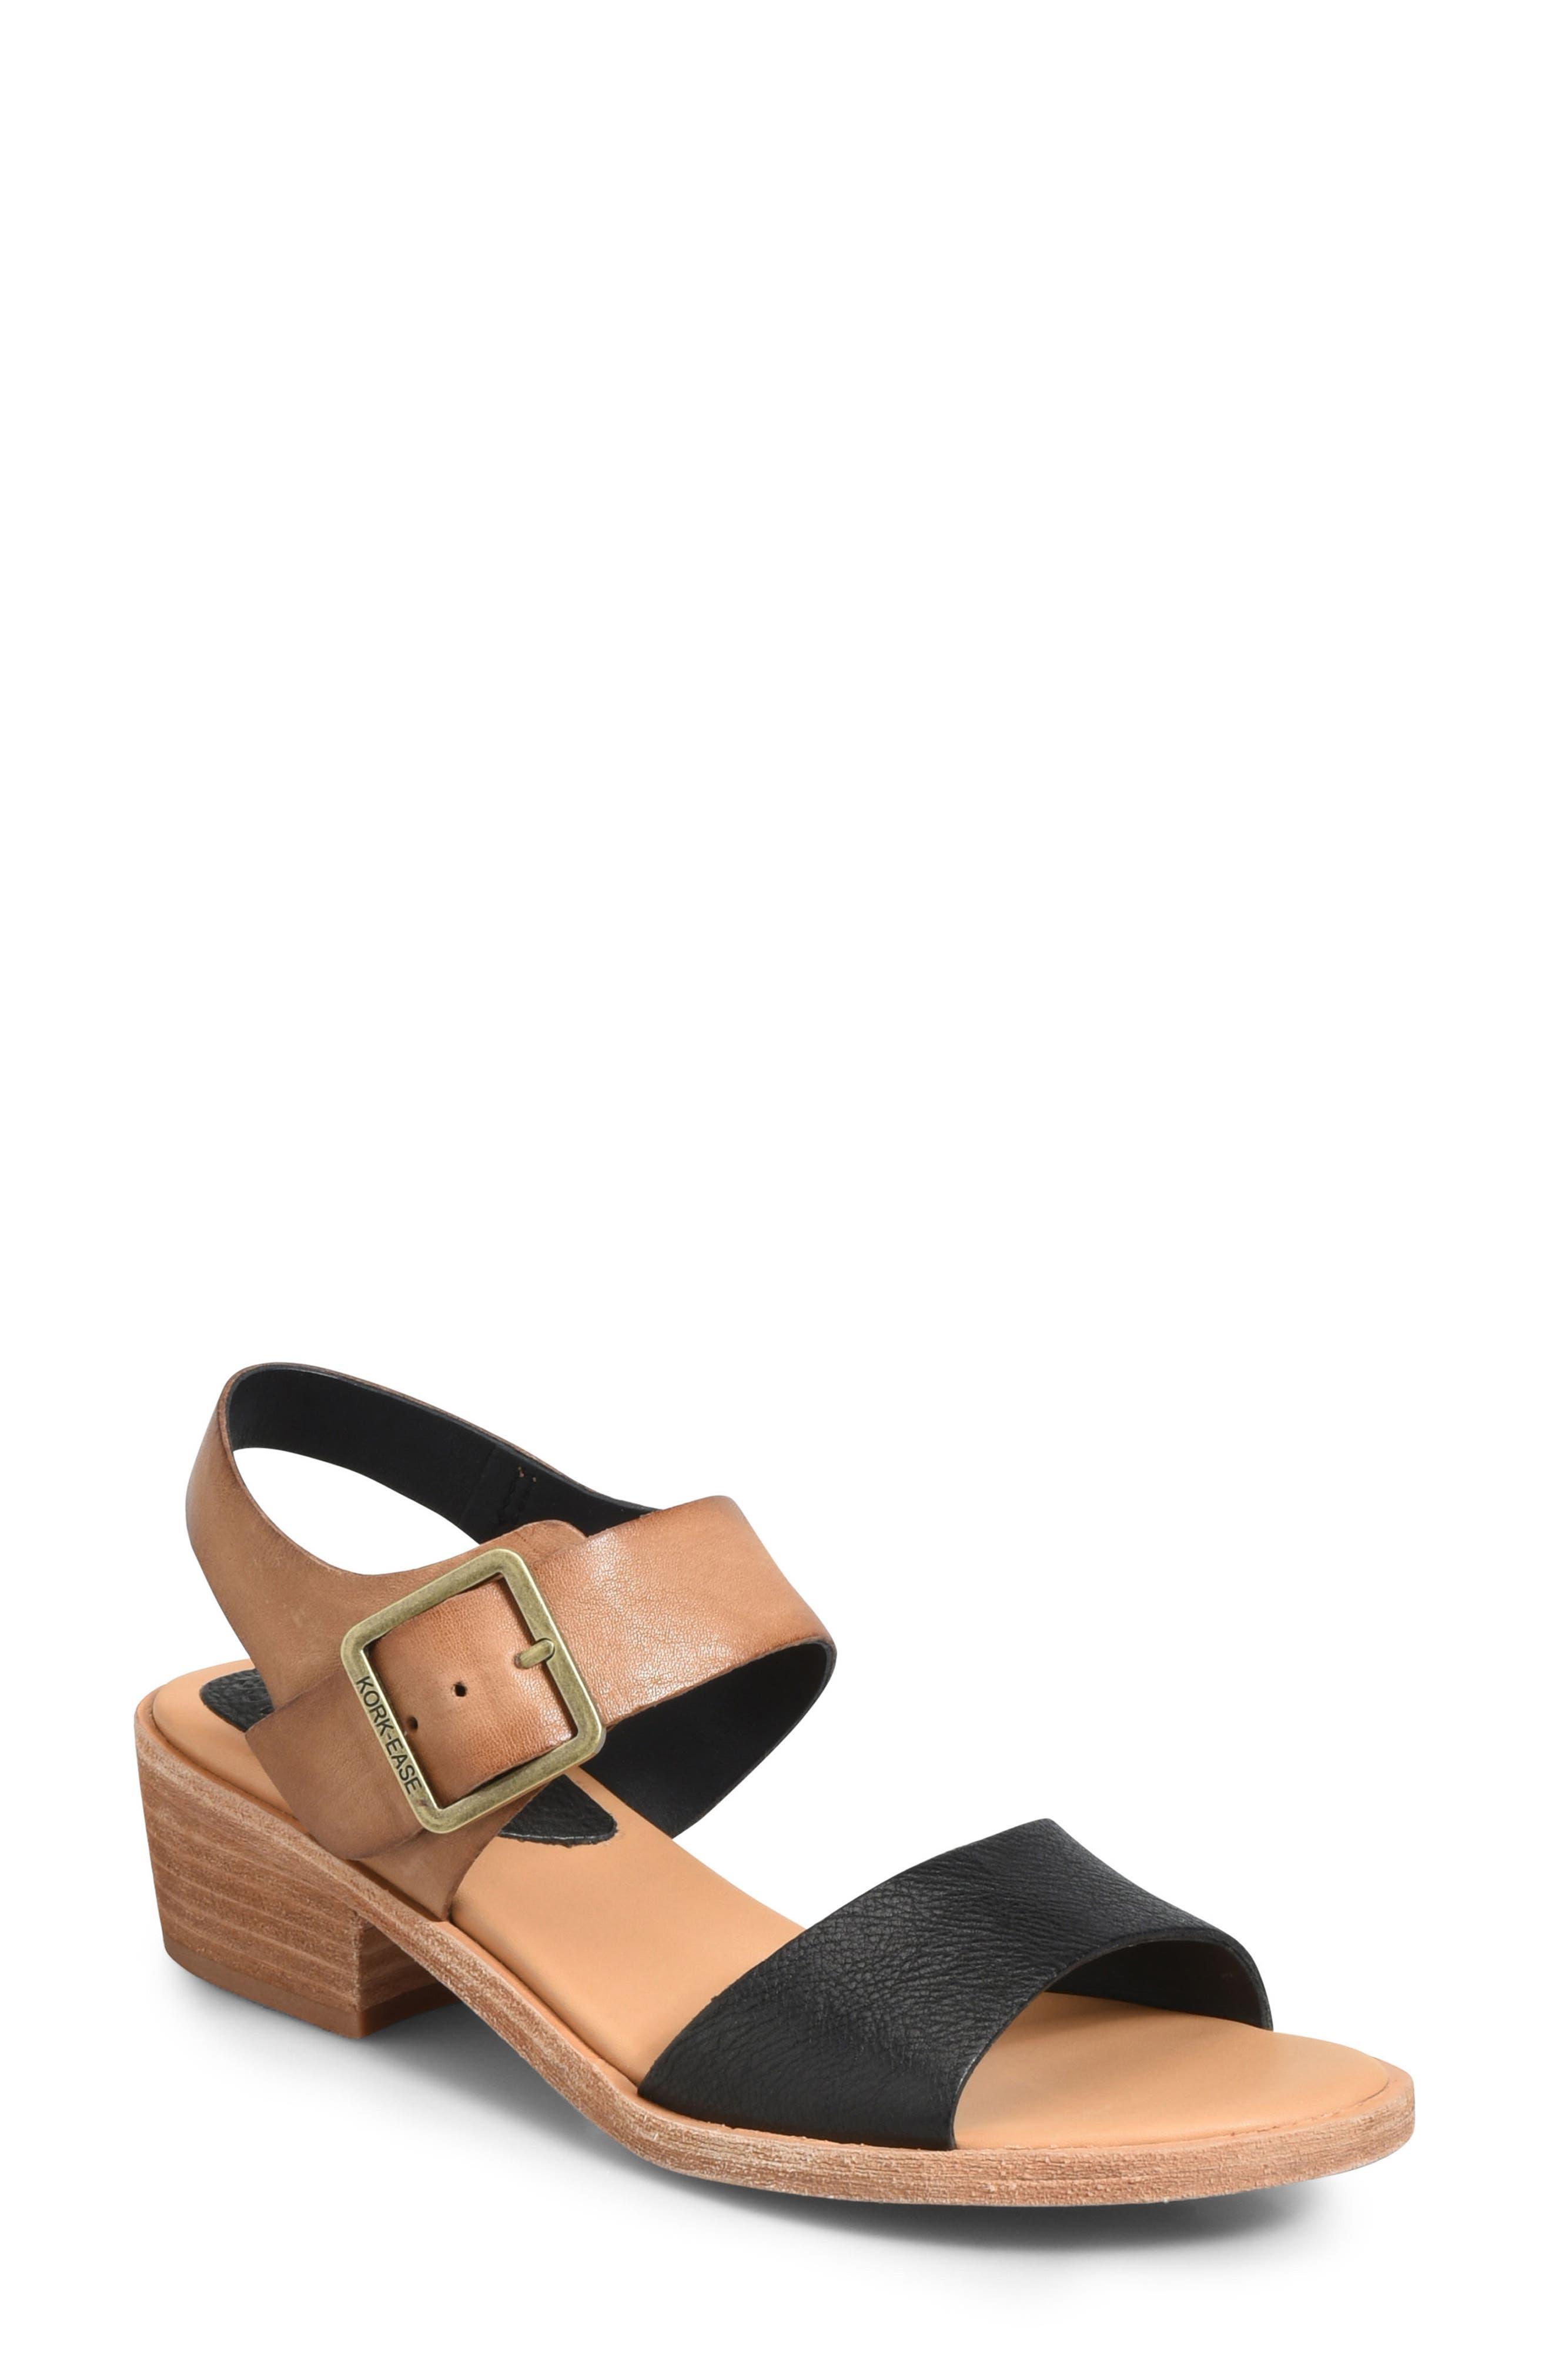 Kork-Ease Myakka Sandal, Brown